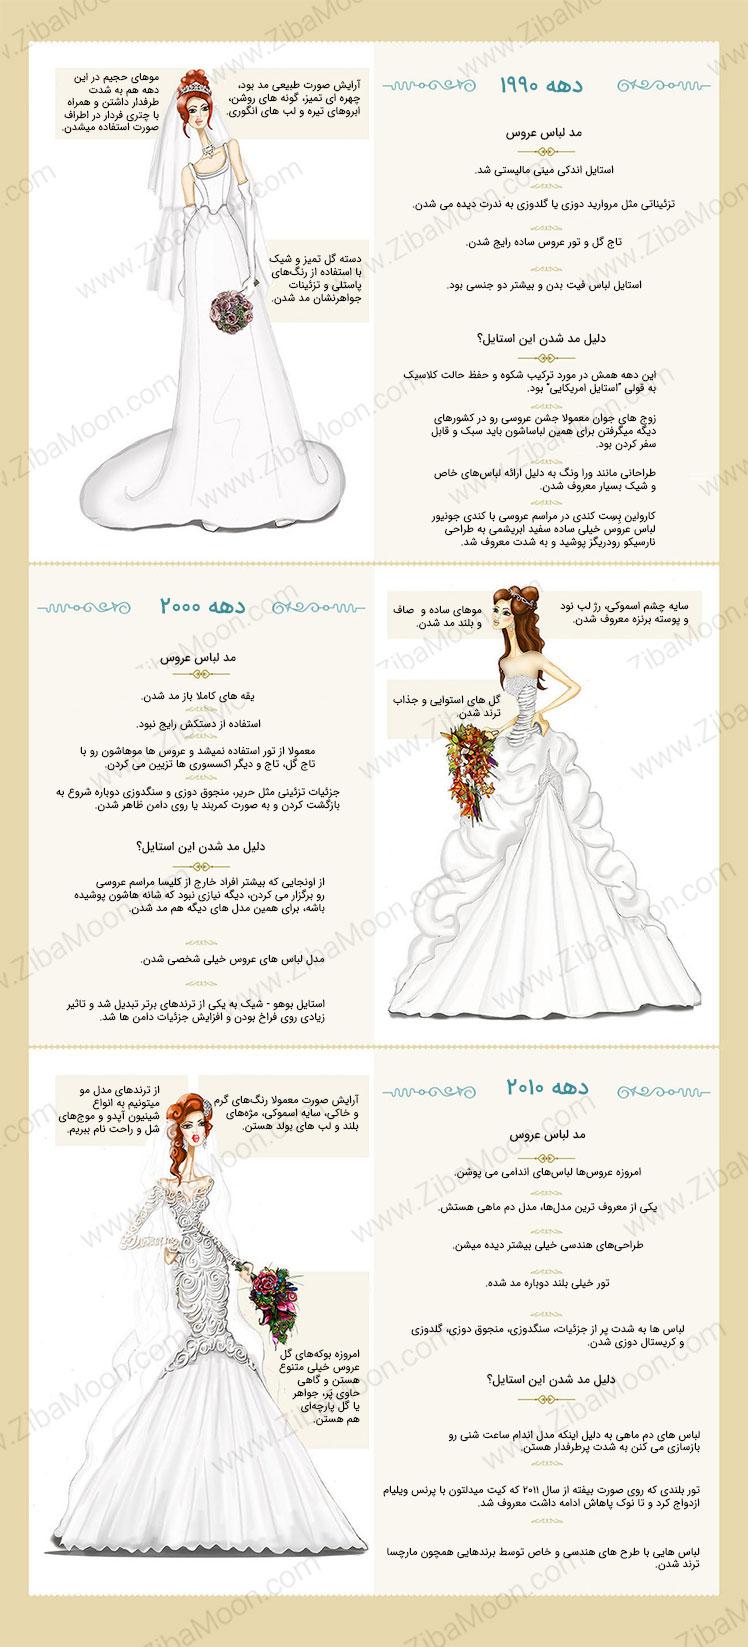 لباس عروس دهه 1960 تا 1980